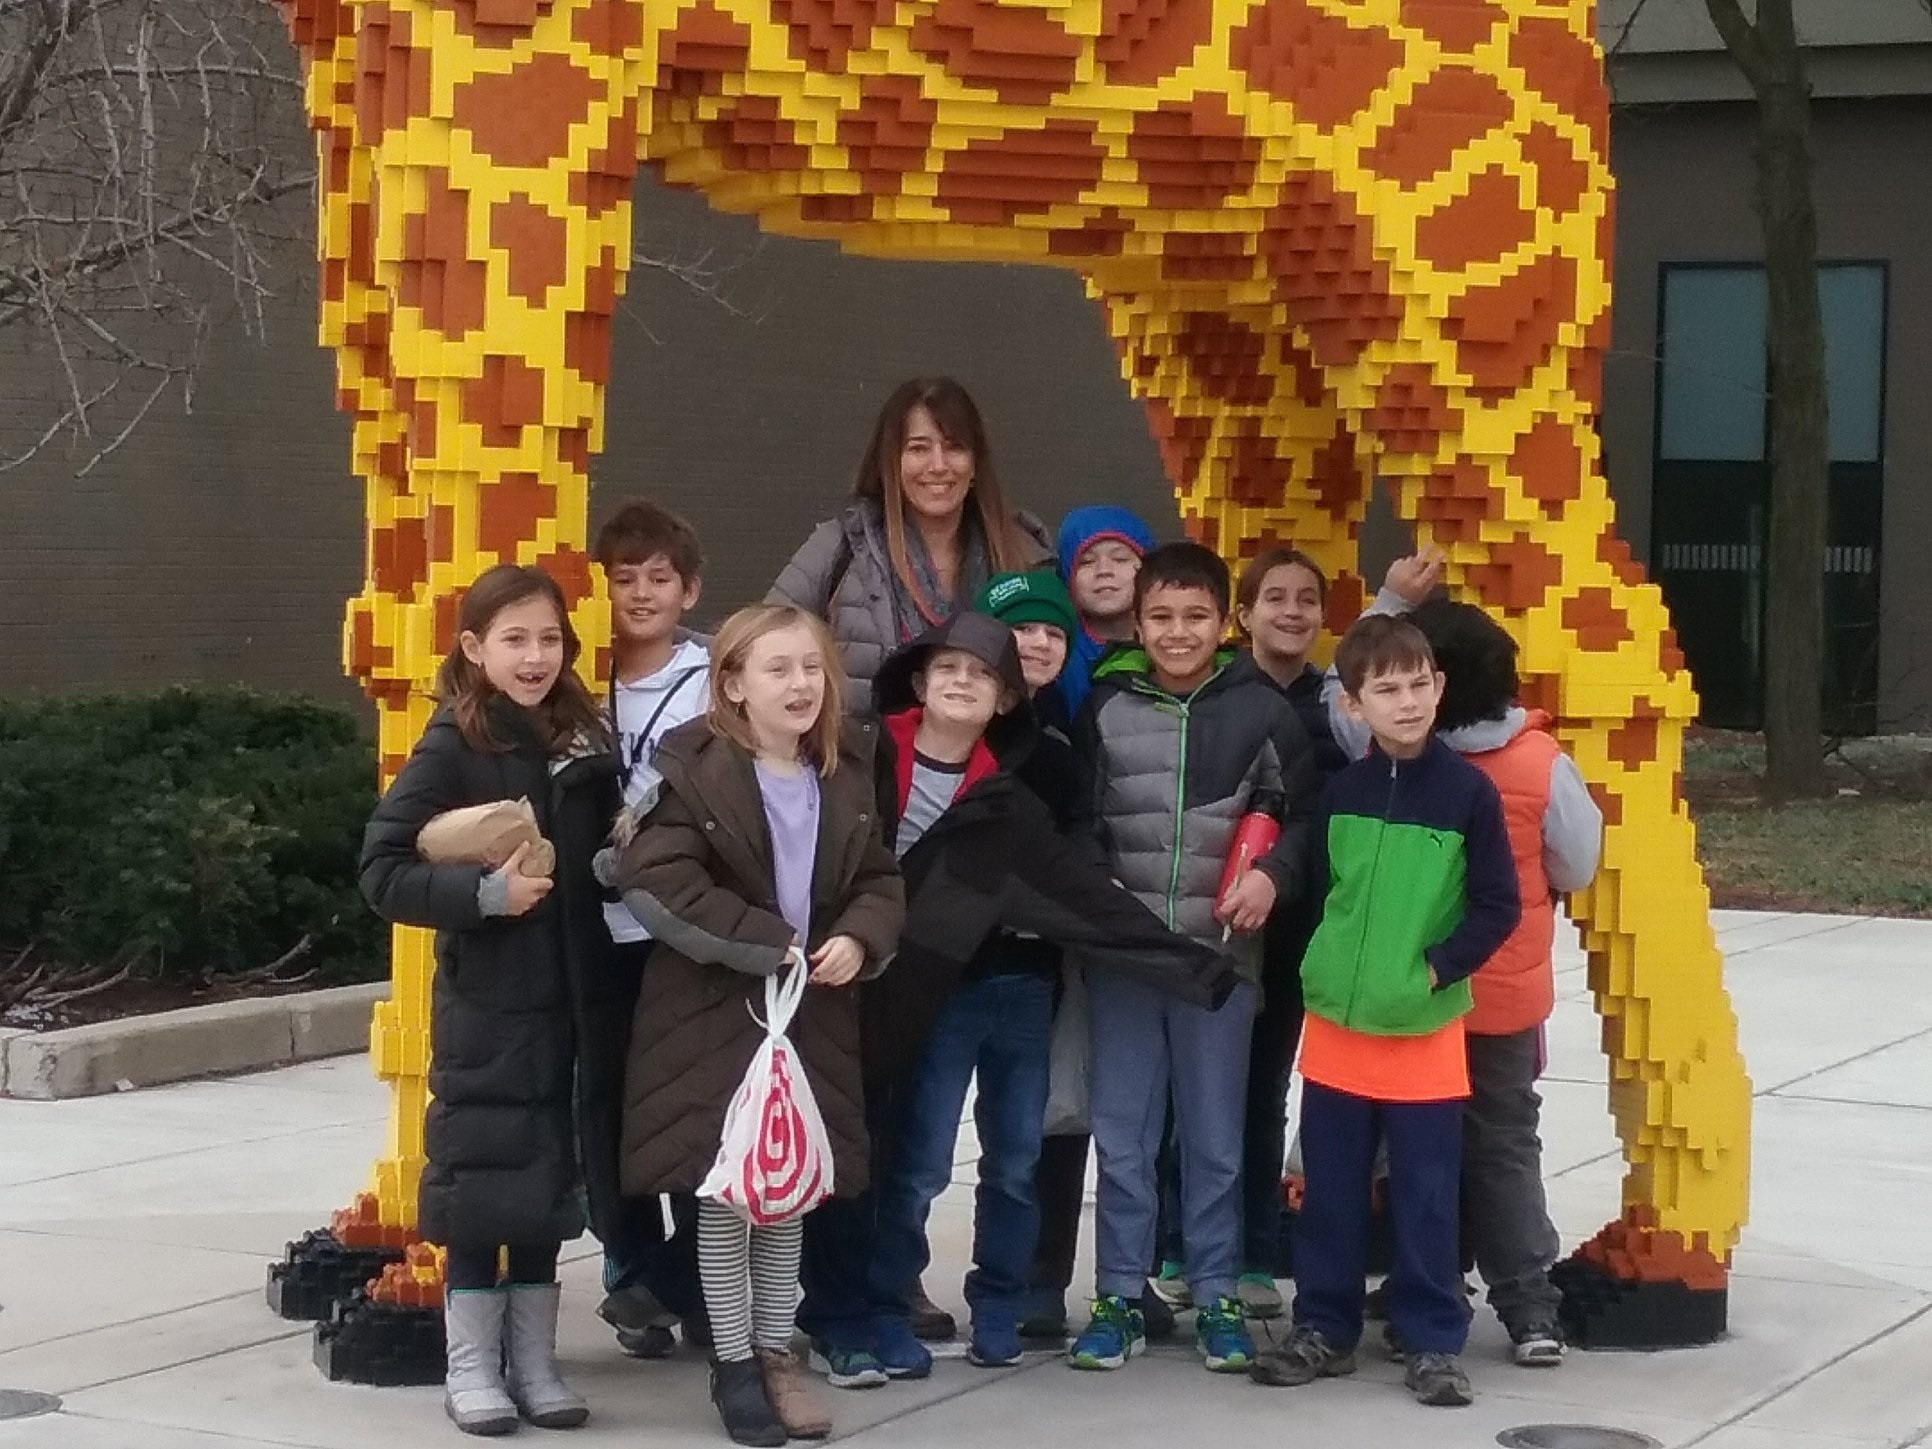 McKinley School - Legoland.jpg